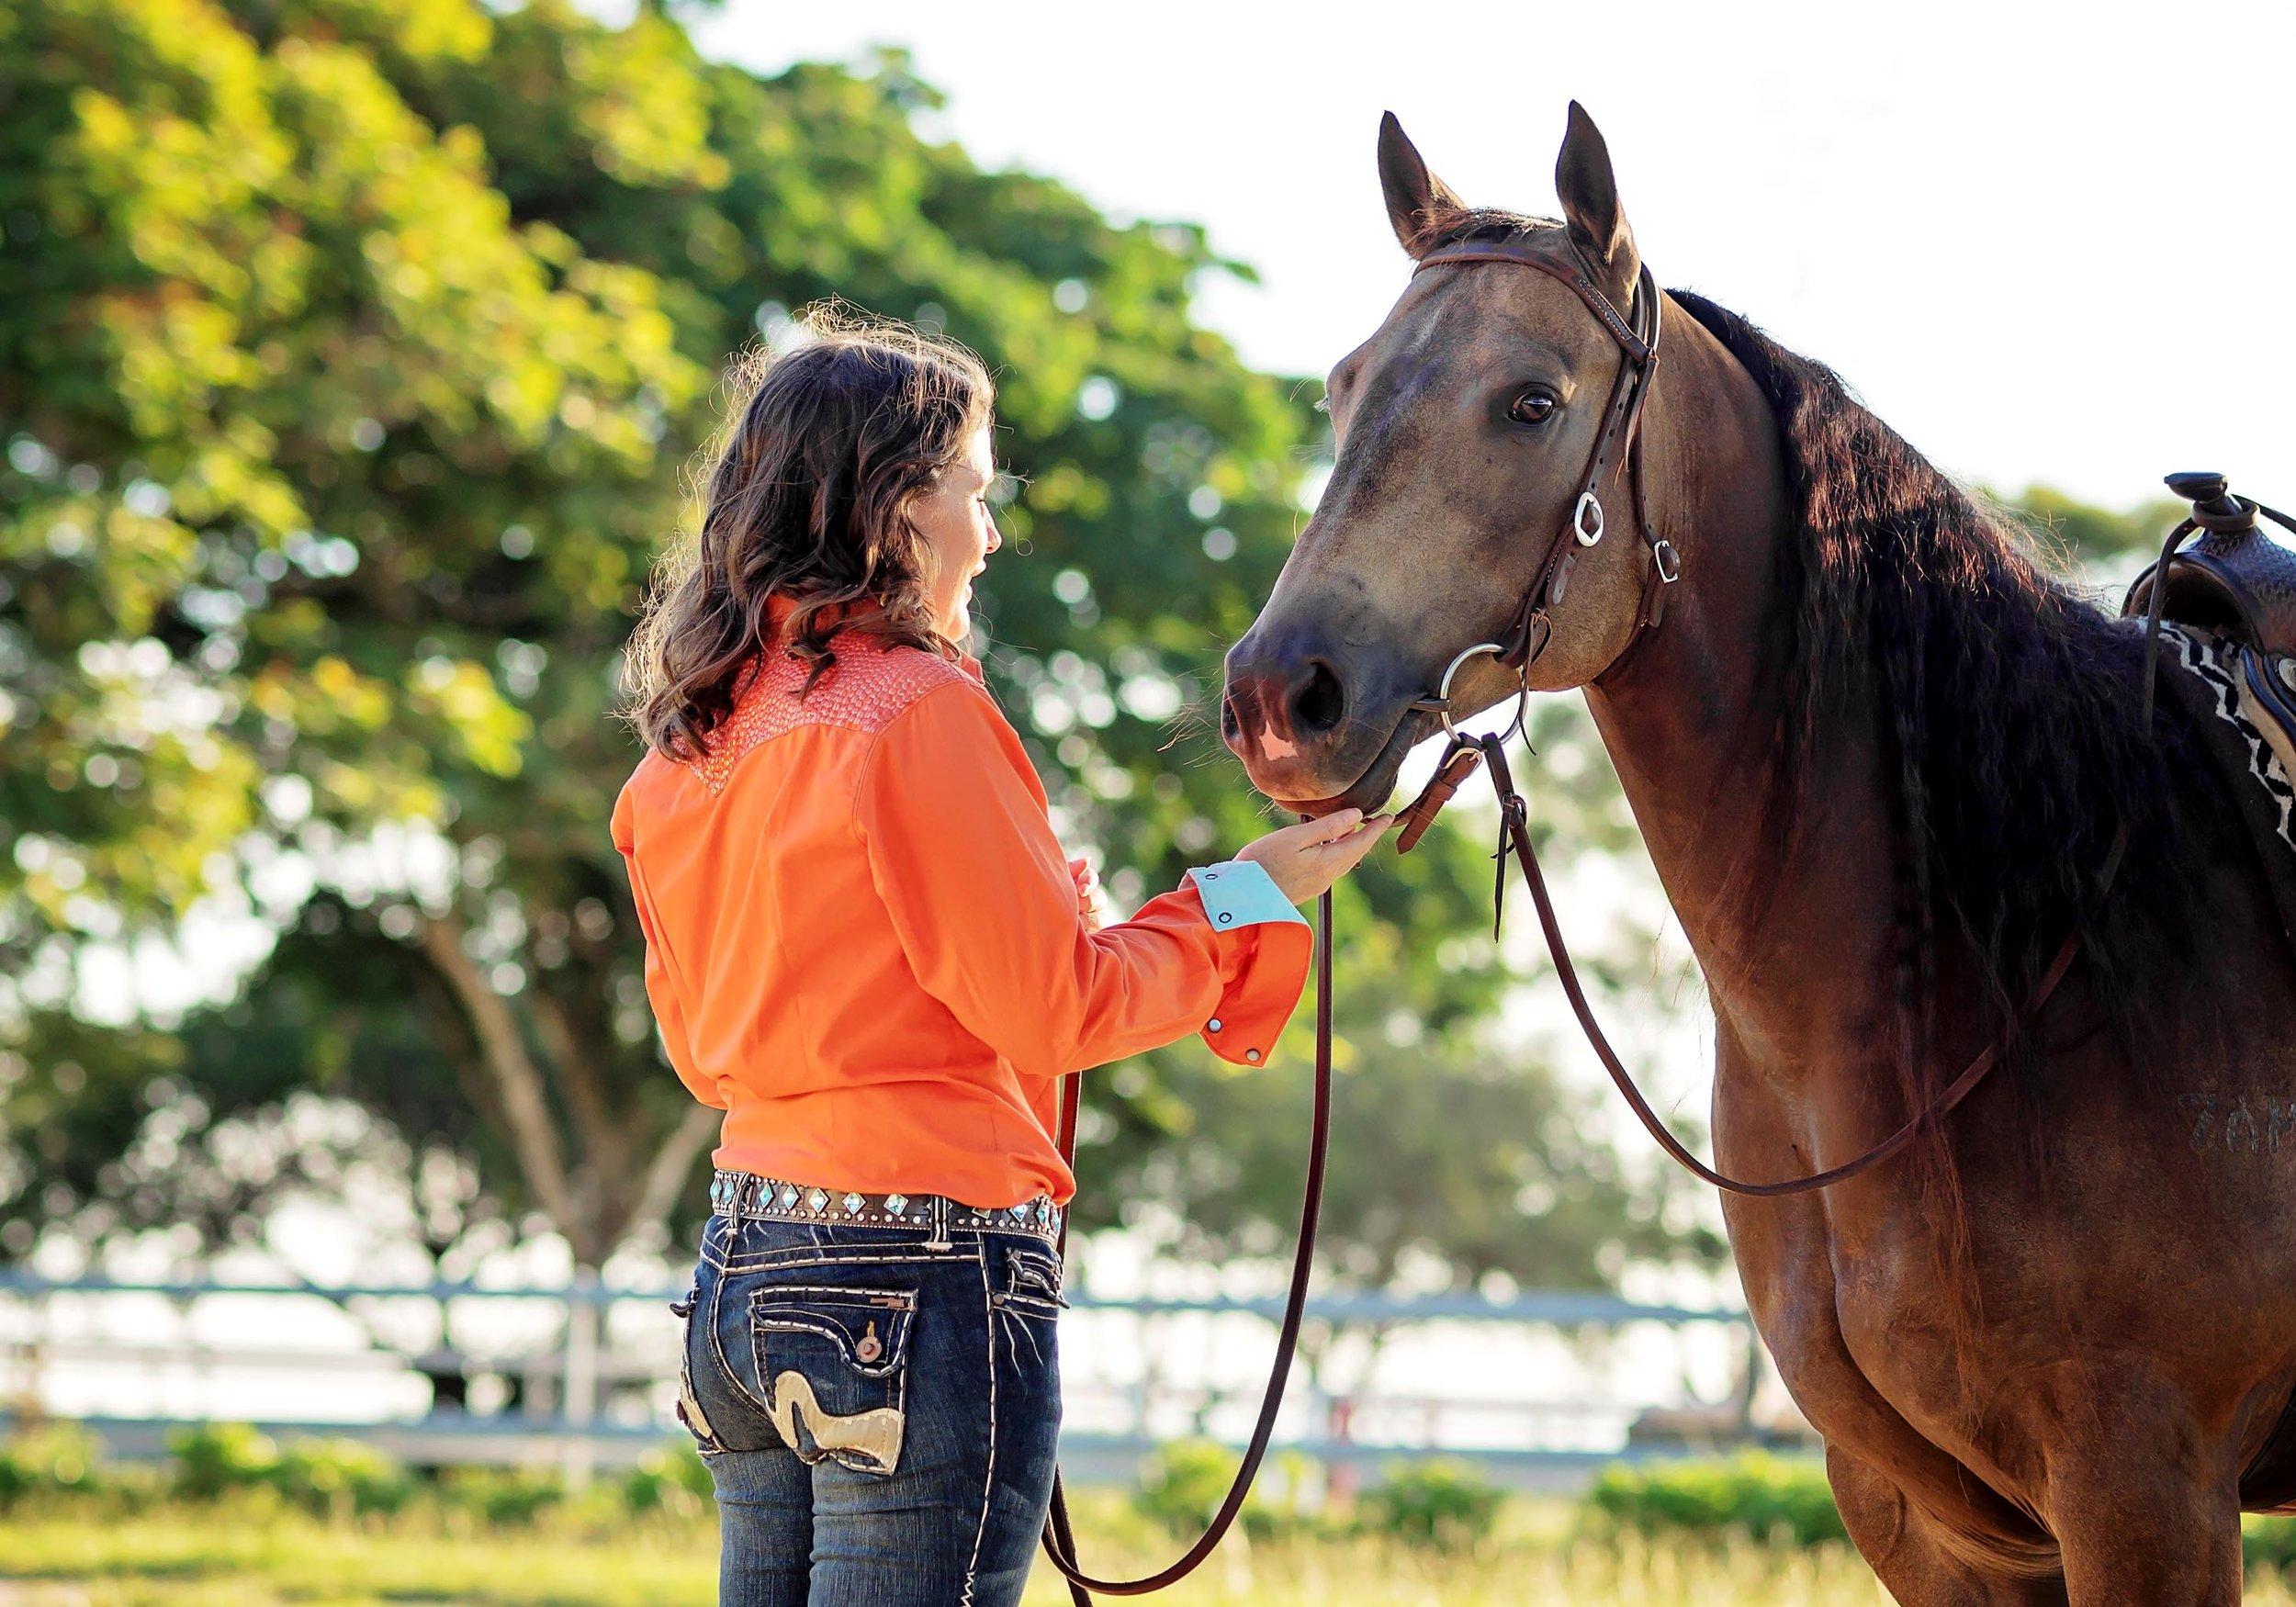 horse-rider-equine-portrait.jpg